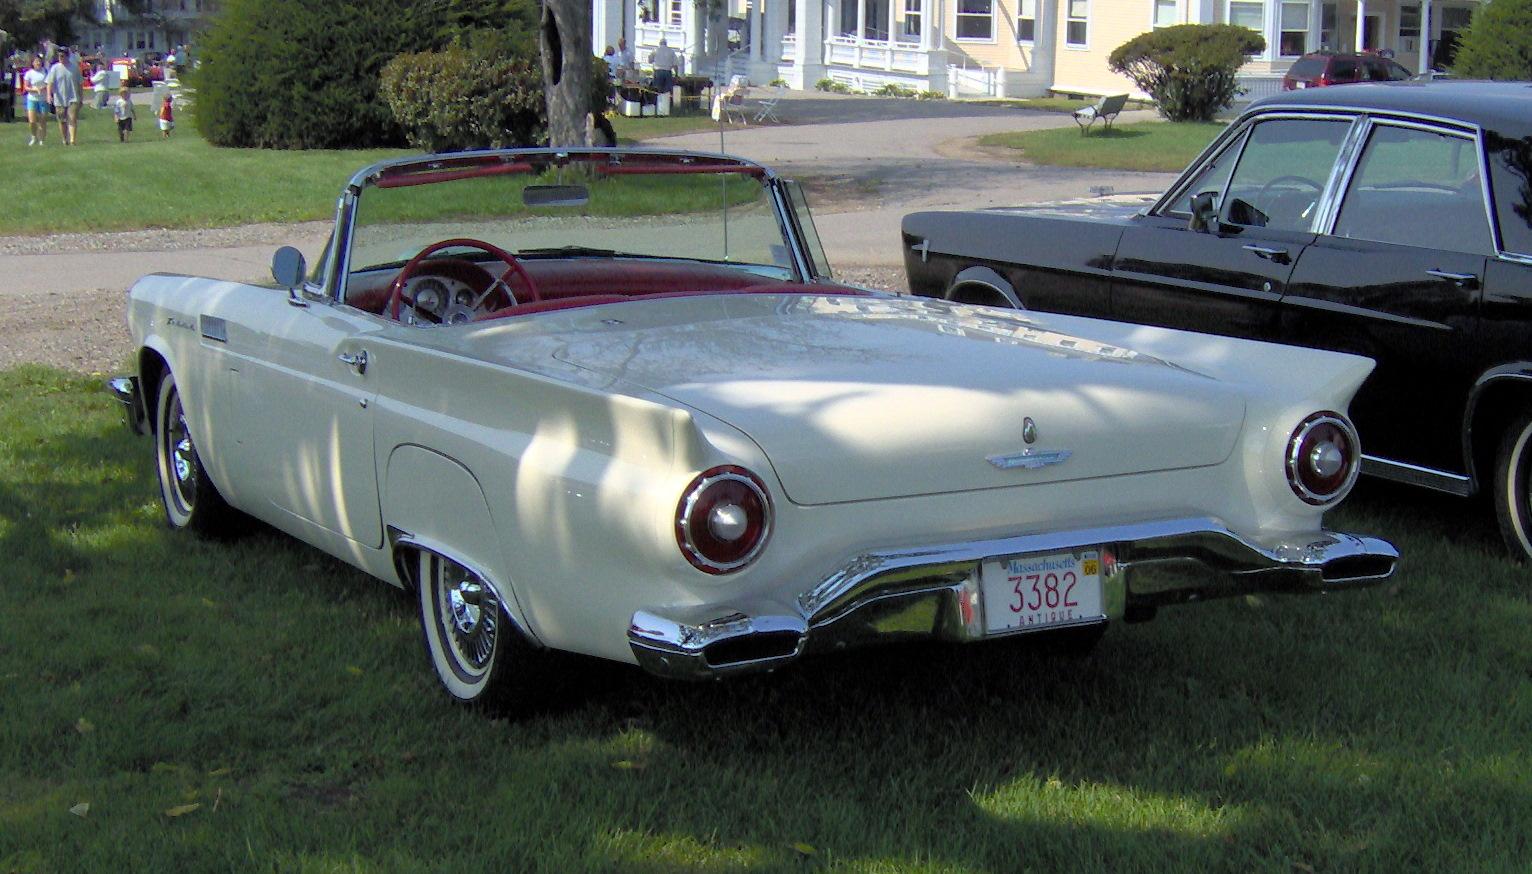 1957 ford thunderbird classic automobiles. Black Bedroom Furniture Sets. Home Design Ideas